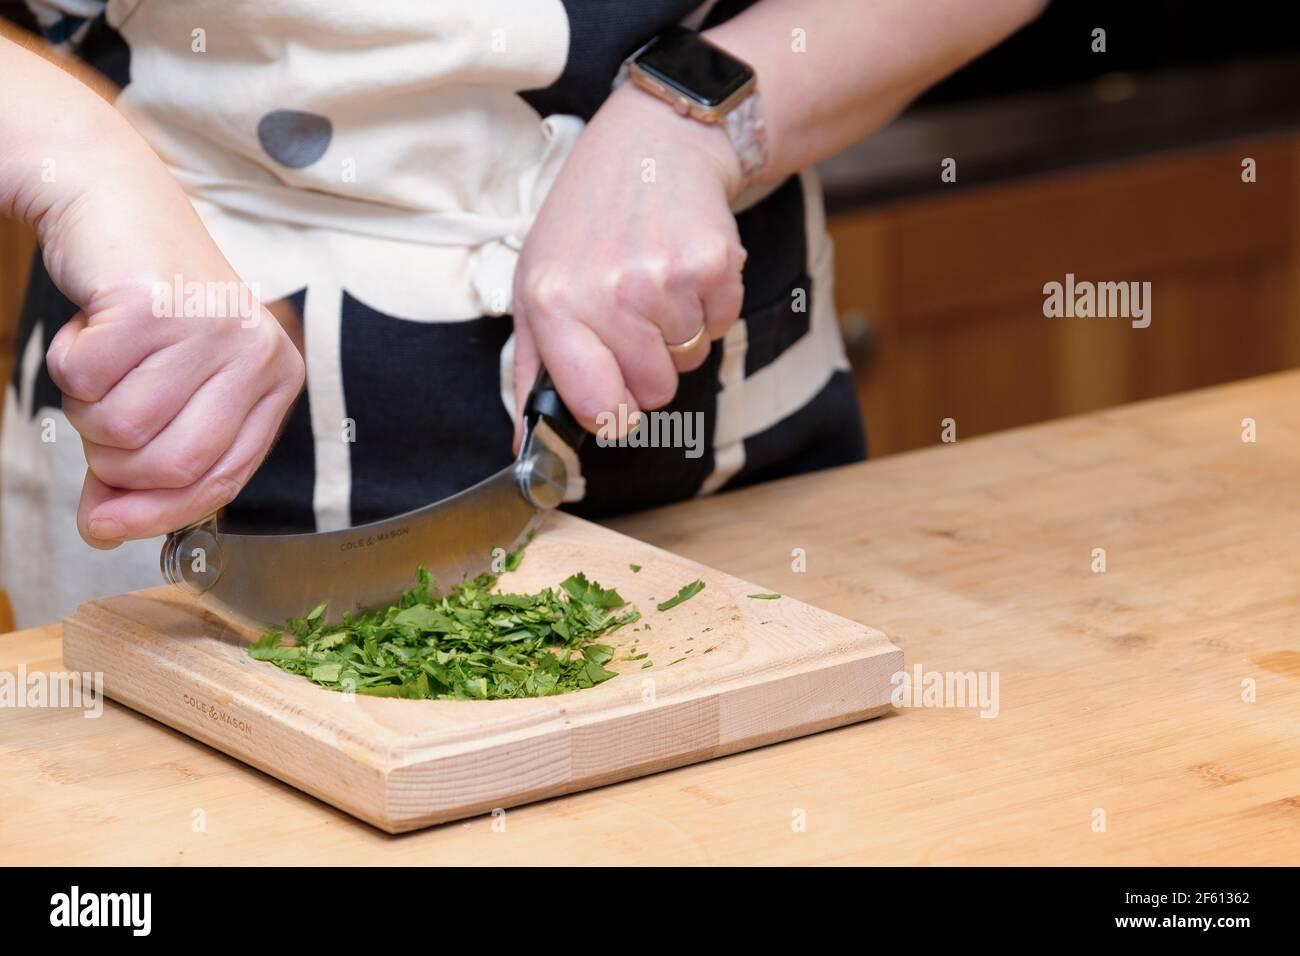 A cook chops fresh herb, coriander, Coriandrum sativum,  in a domestic kitchen using a Hachoir or Ha choir cutter and cutting board Stock Photo